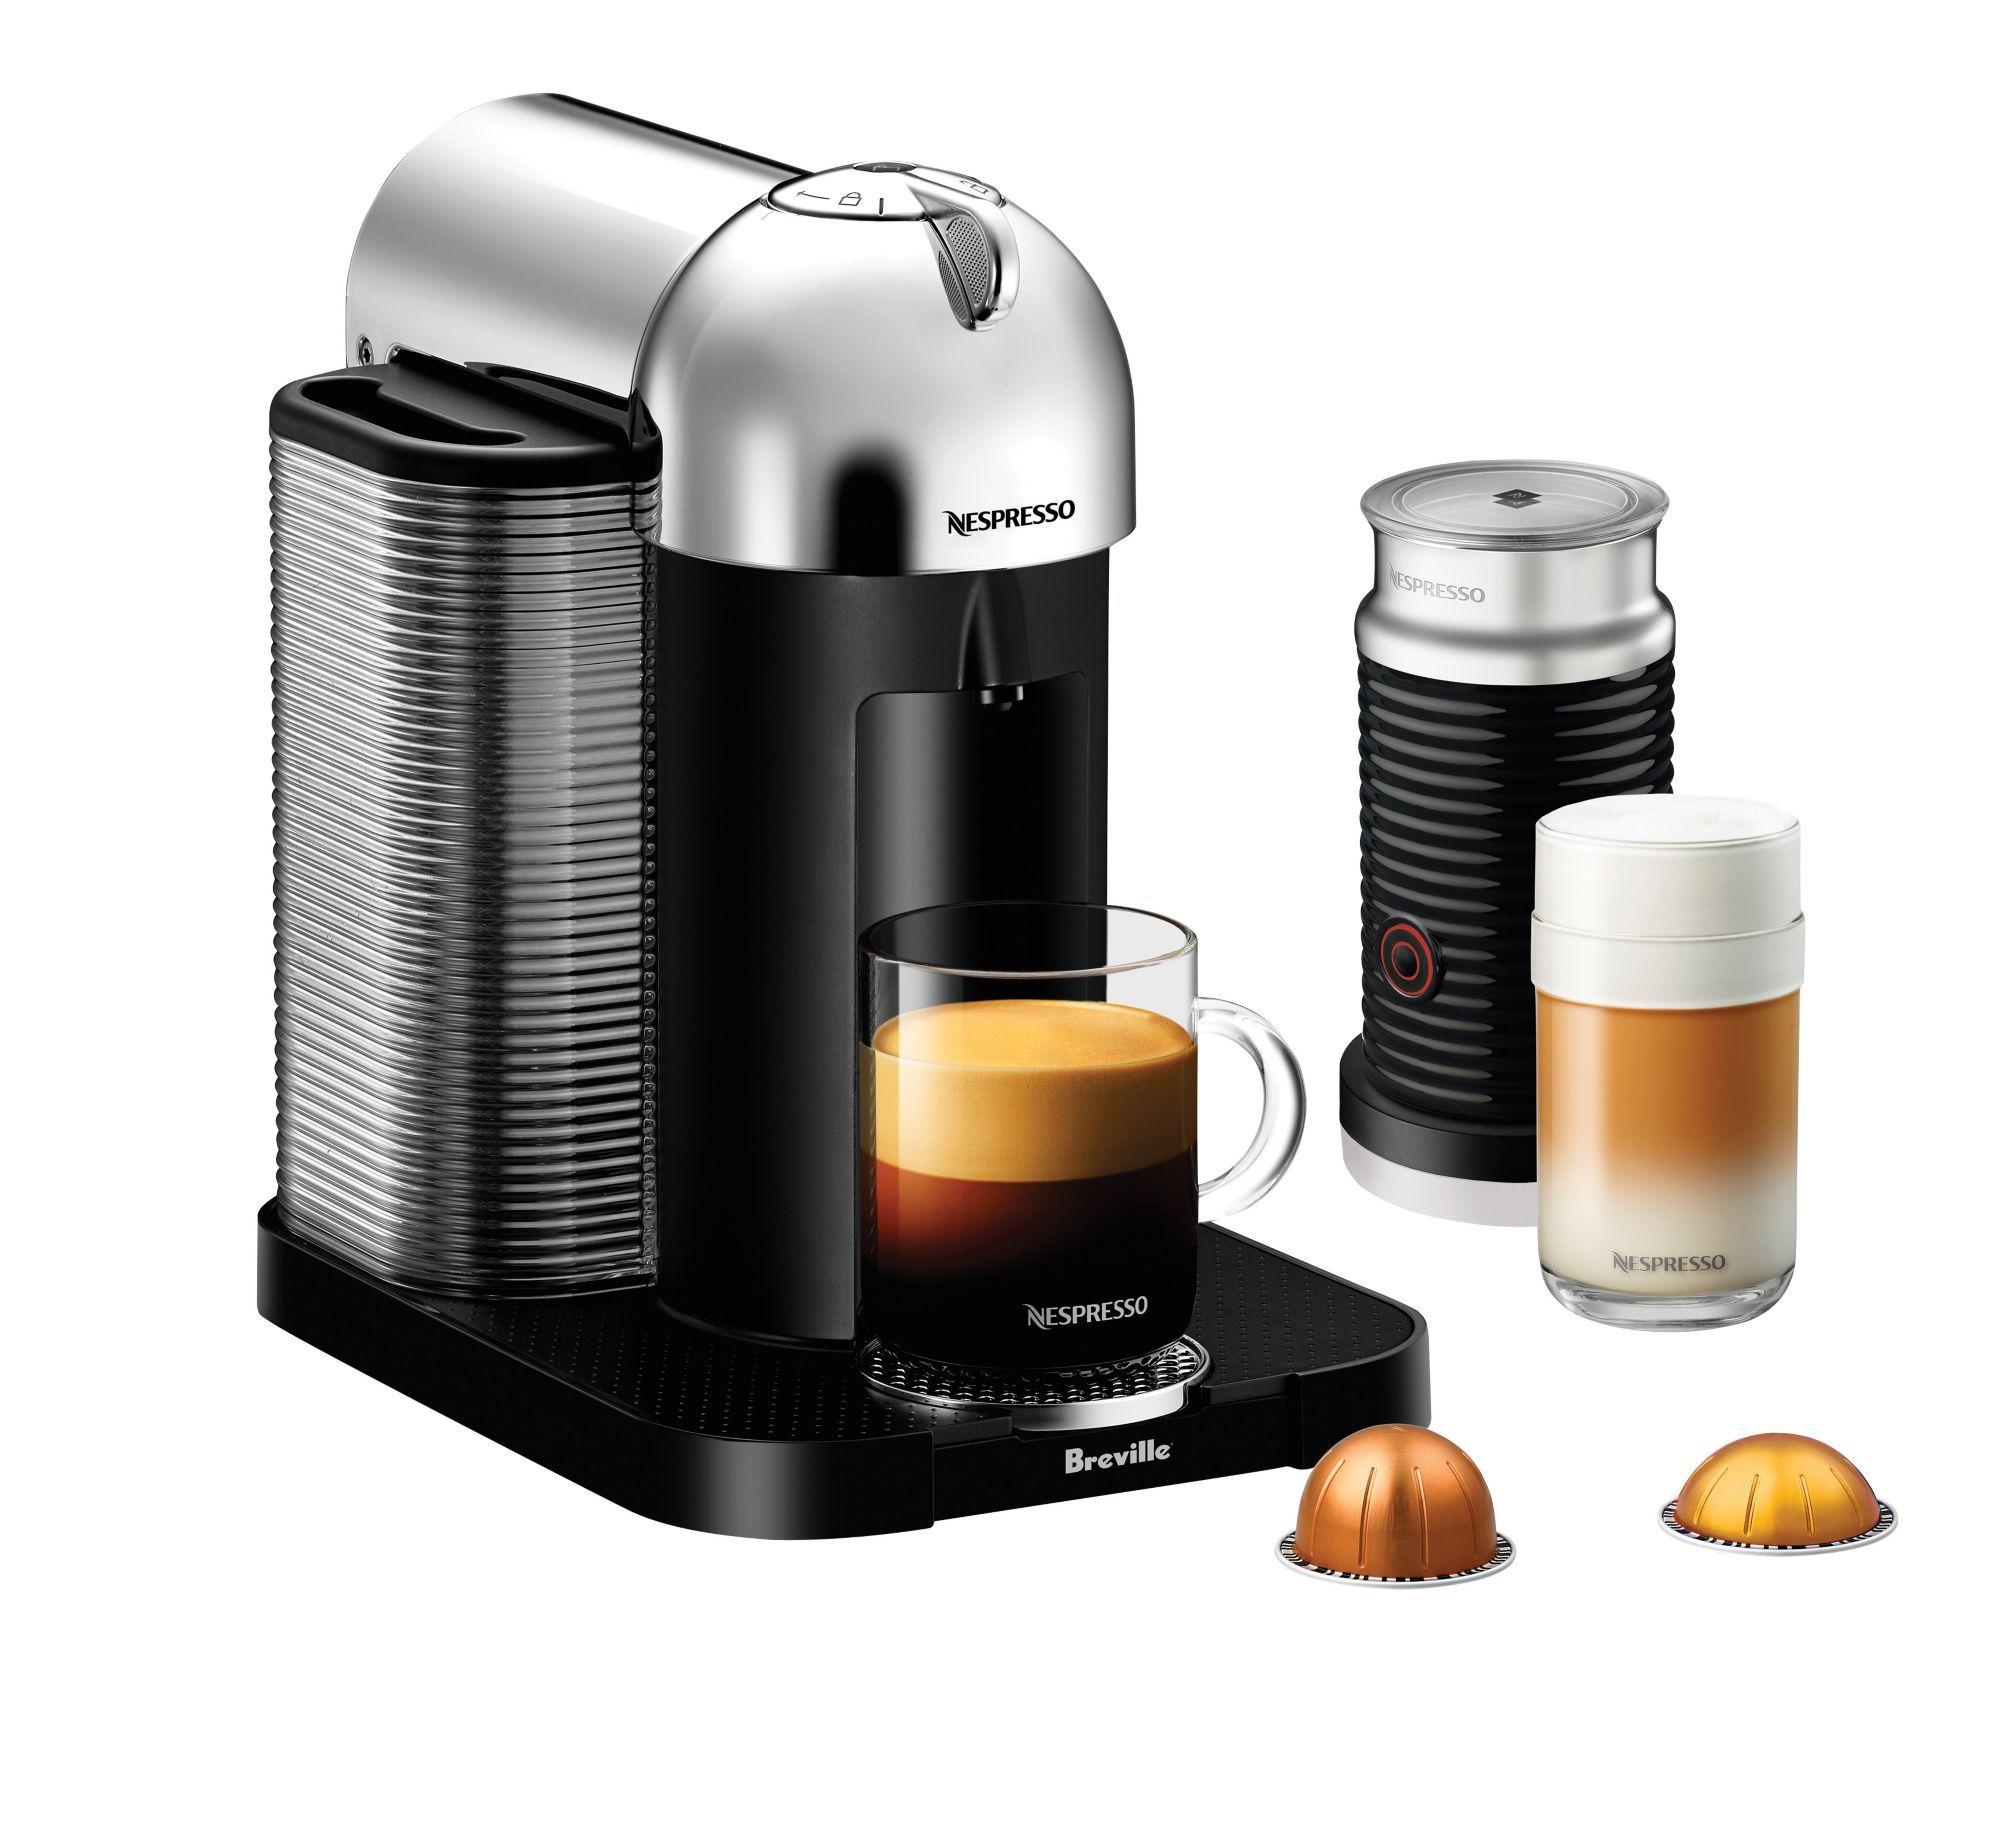 Canadian Tire Coffee and espresso maker, Nespresso